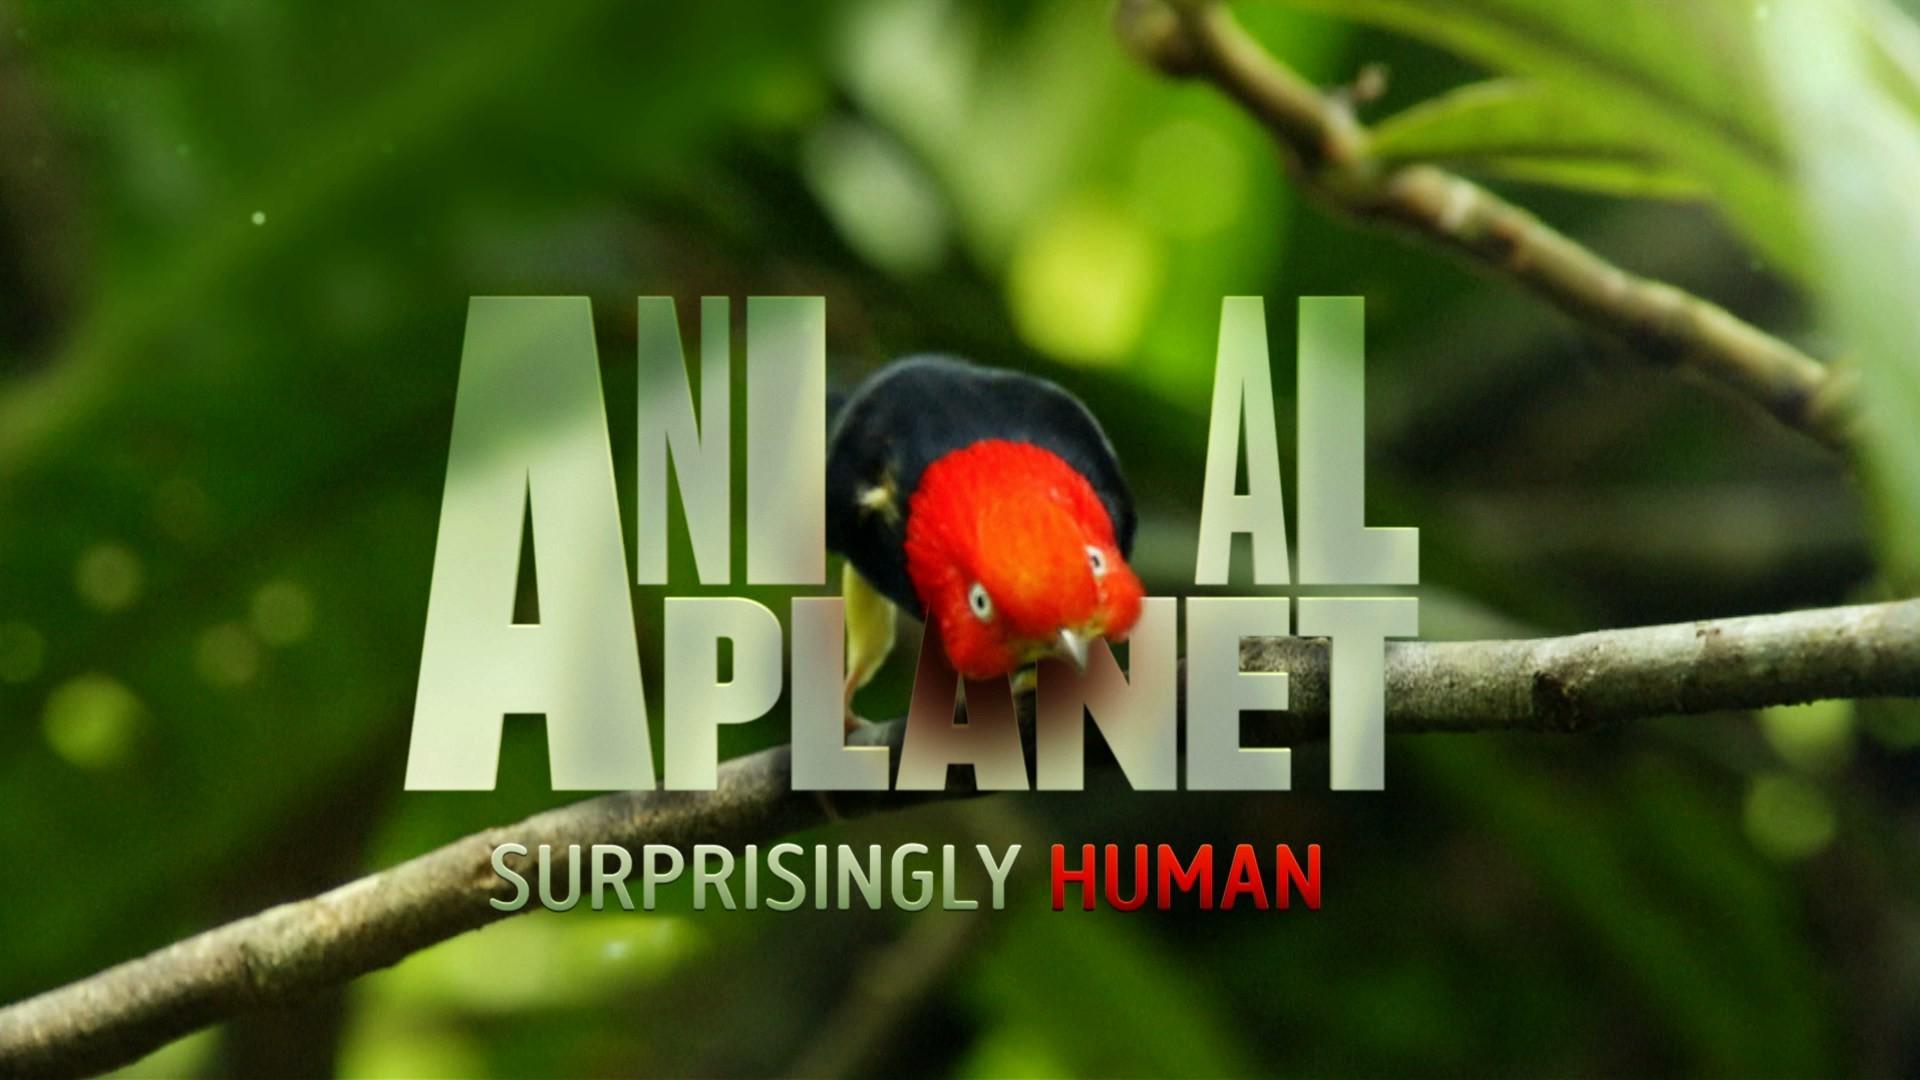 Aninimal Book: Animal Planet Wallpaper (65+ images)